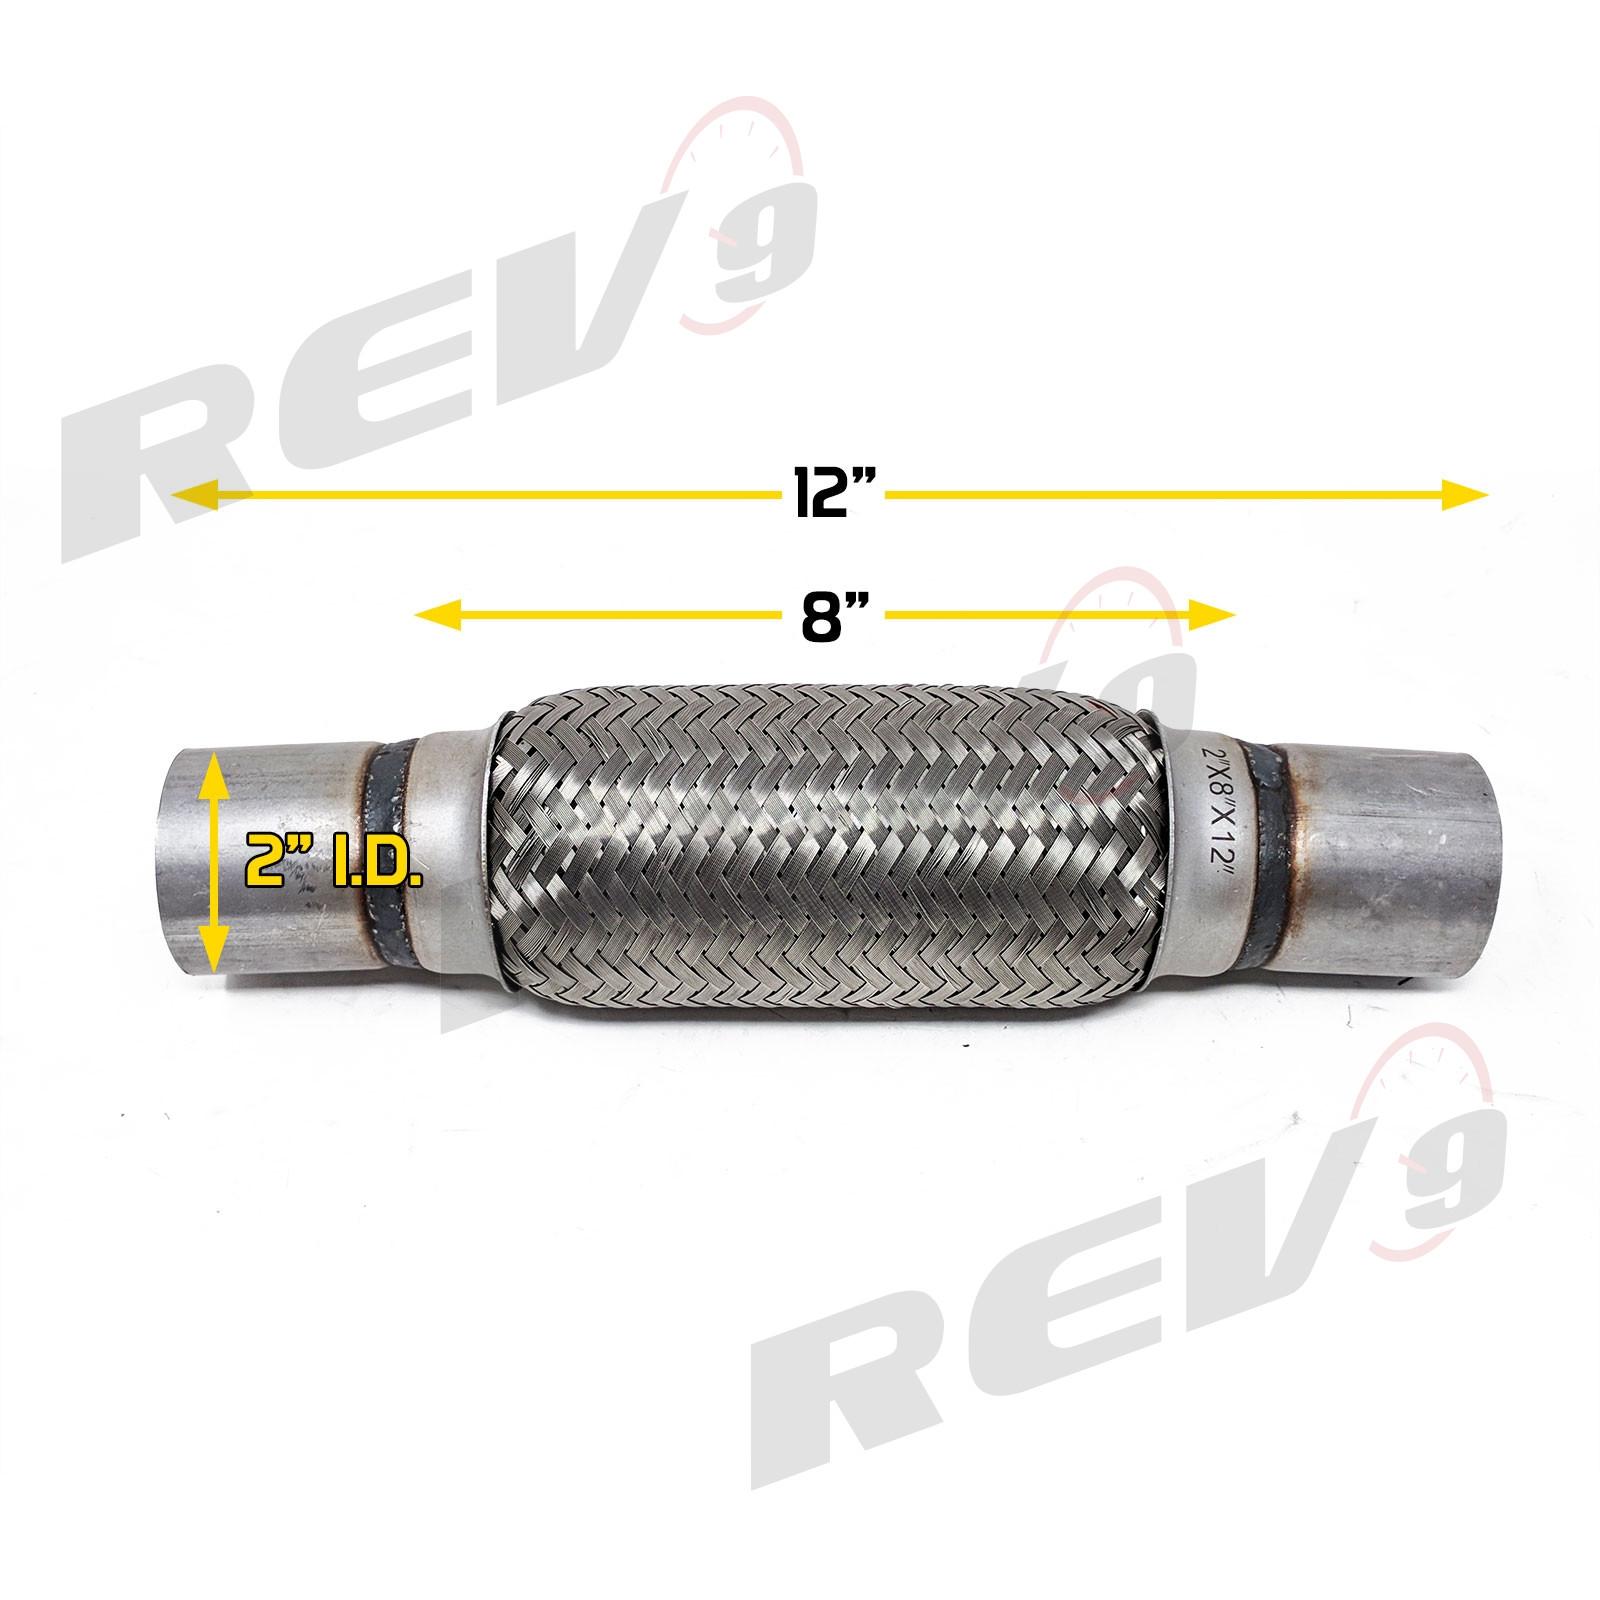 Rev power stainless steel flex pipe exhaust couplings